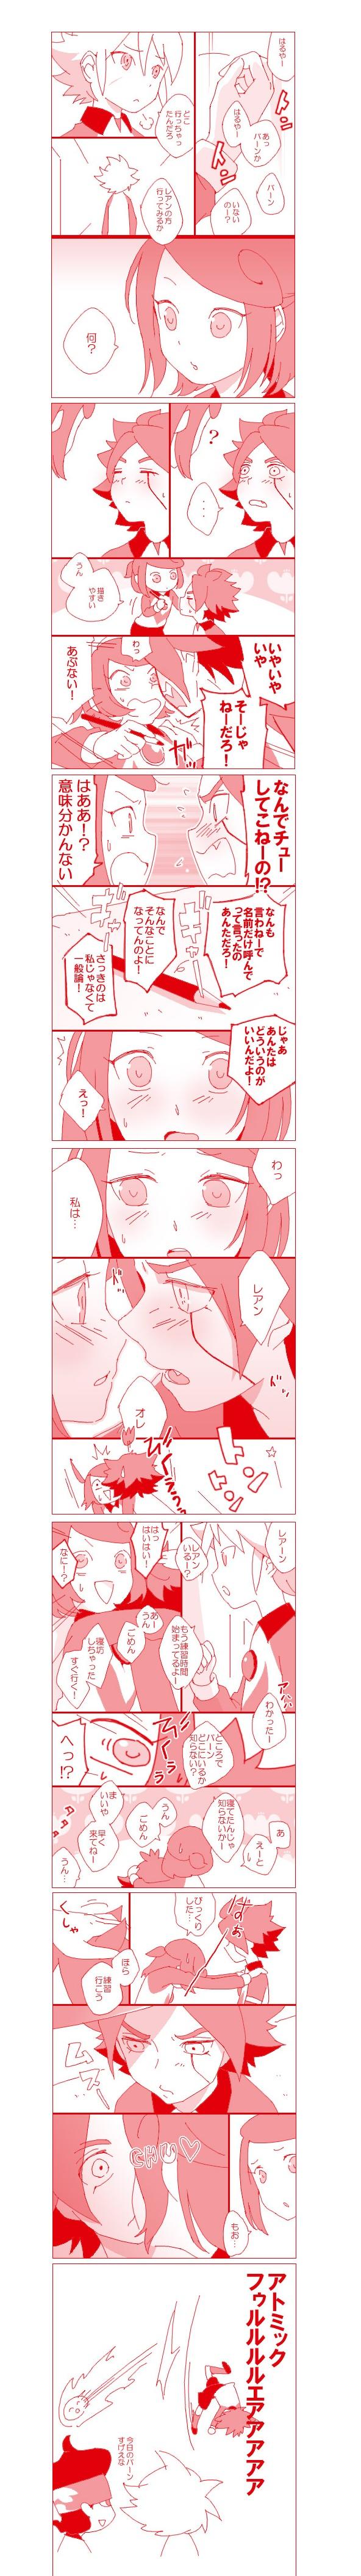 Tags: Anime, Inazuma Eleven, Hasuike An, Atsuishi Shigeto, Nagumo Haruya, Netsuha Natsuhiko, Eyeliner, Knocking, Pixiv